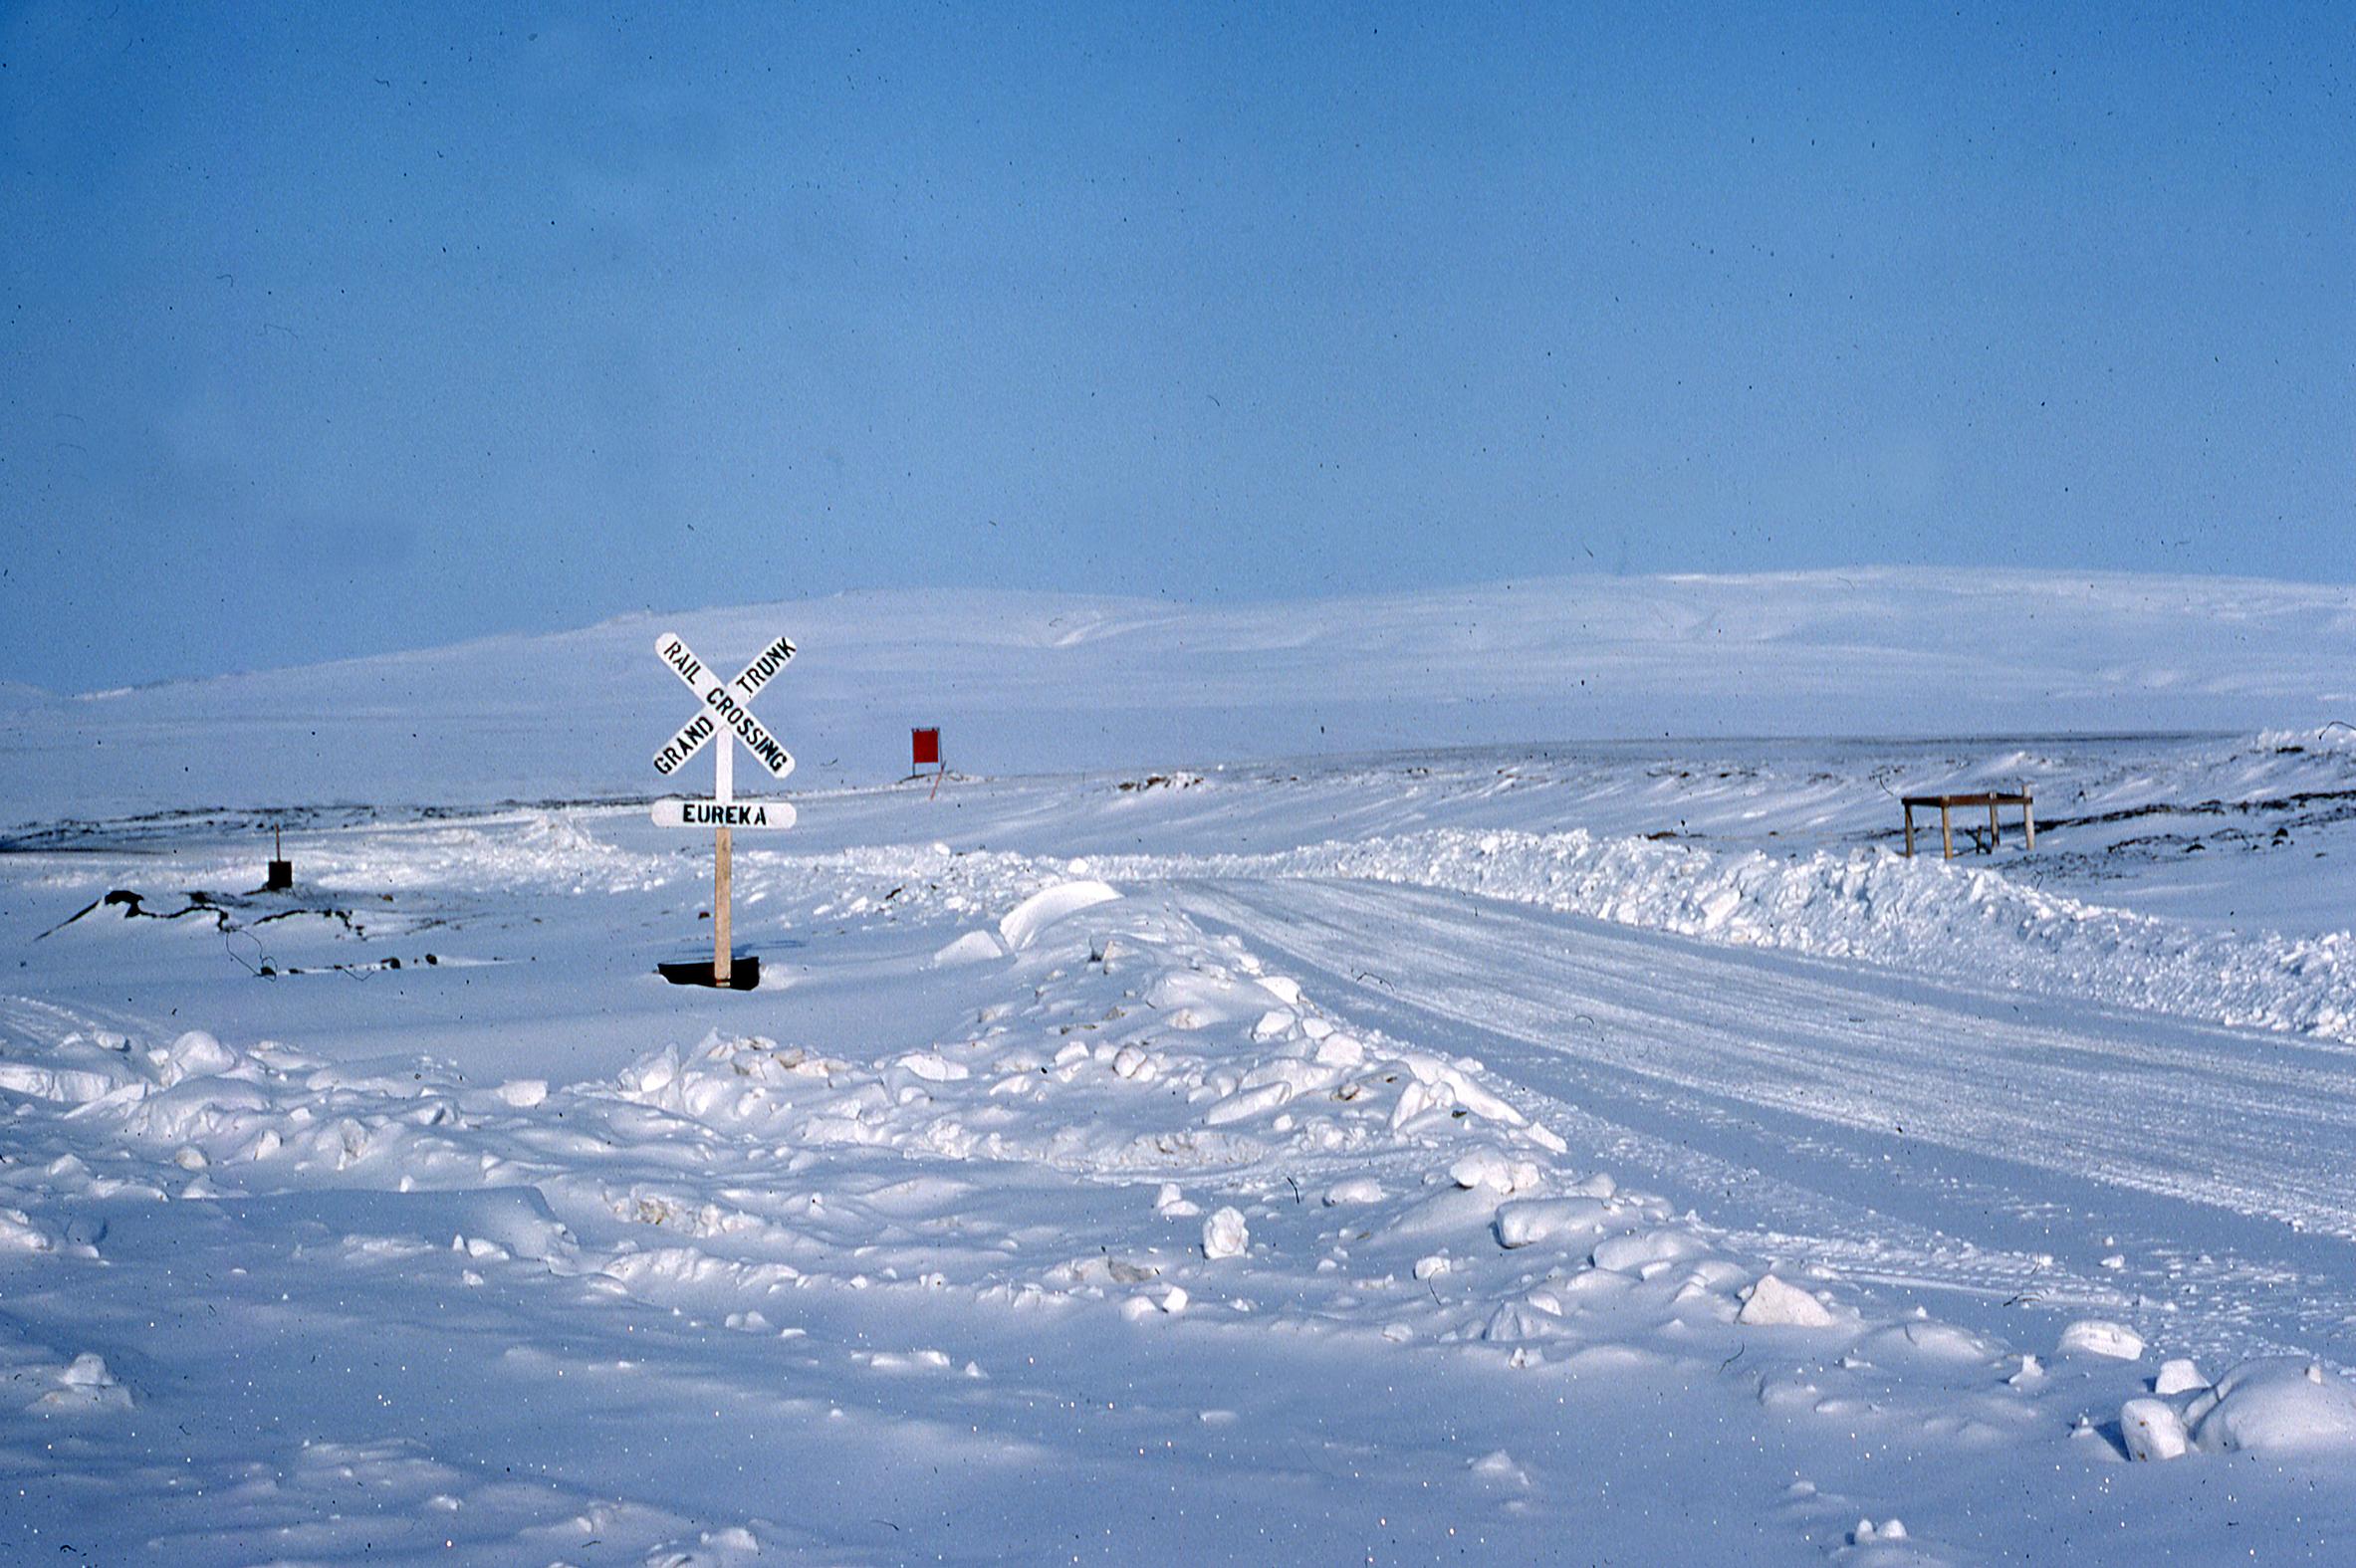 Eureka, Nunavut, humour arctique / Arctic humour; 051-09_1983-05-xx-R.jpg